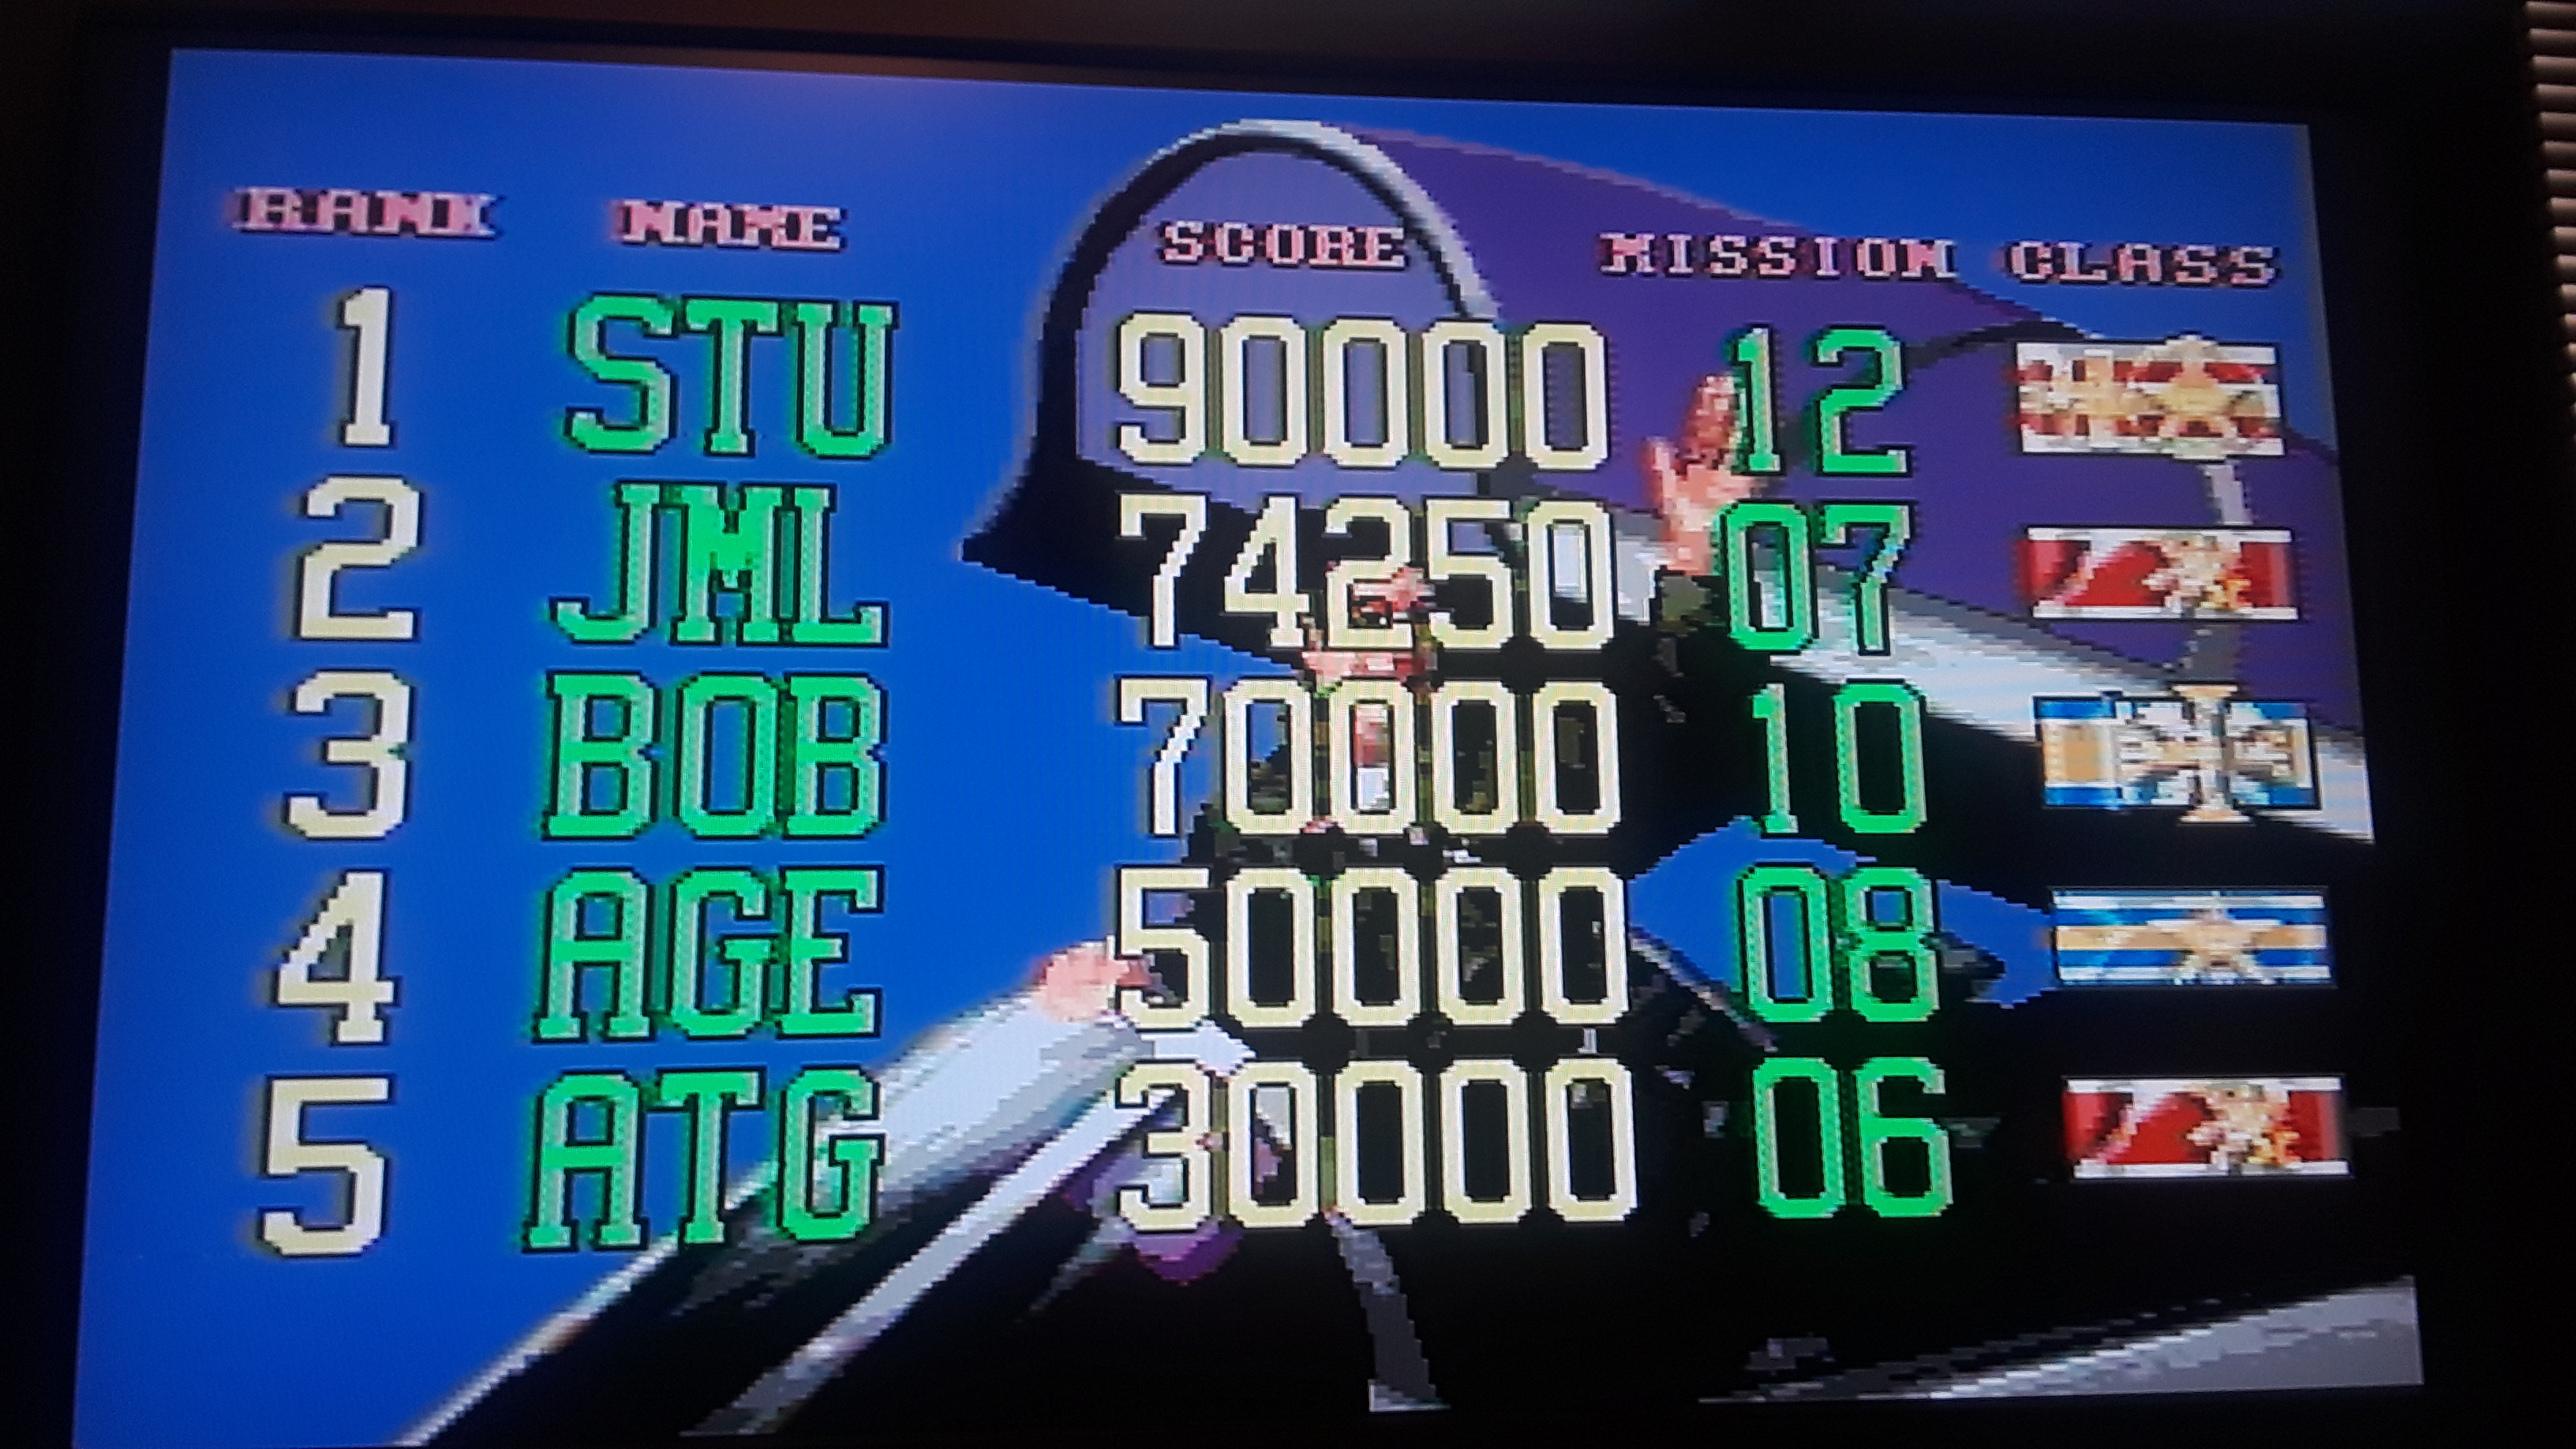 JML101582: G-LOC: Air Battle (Sega Genesis / MegaDrive Emulated) 74,250 points on 2019-07-23 18:20:50